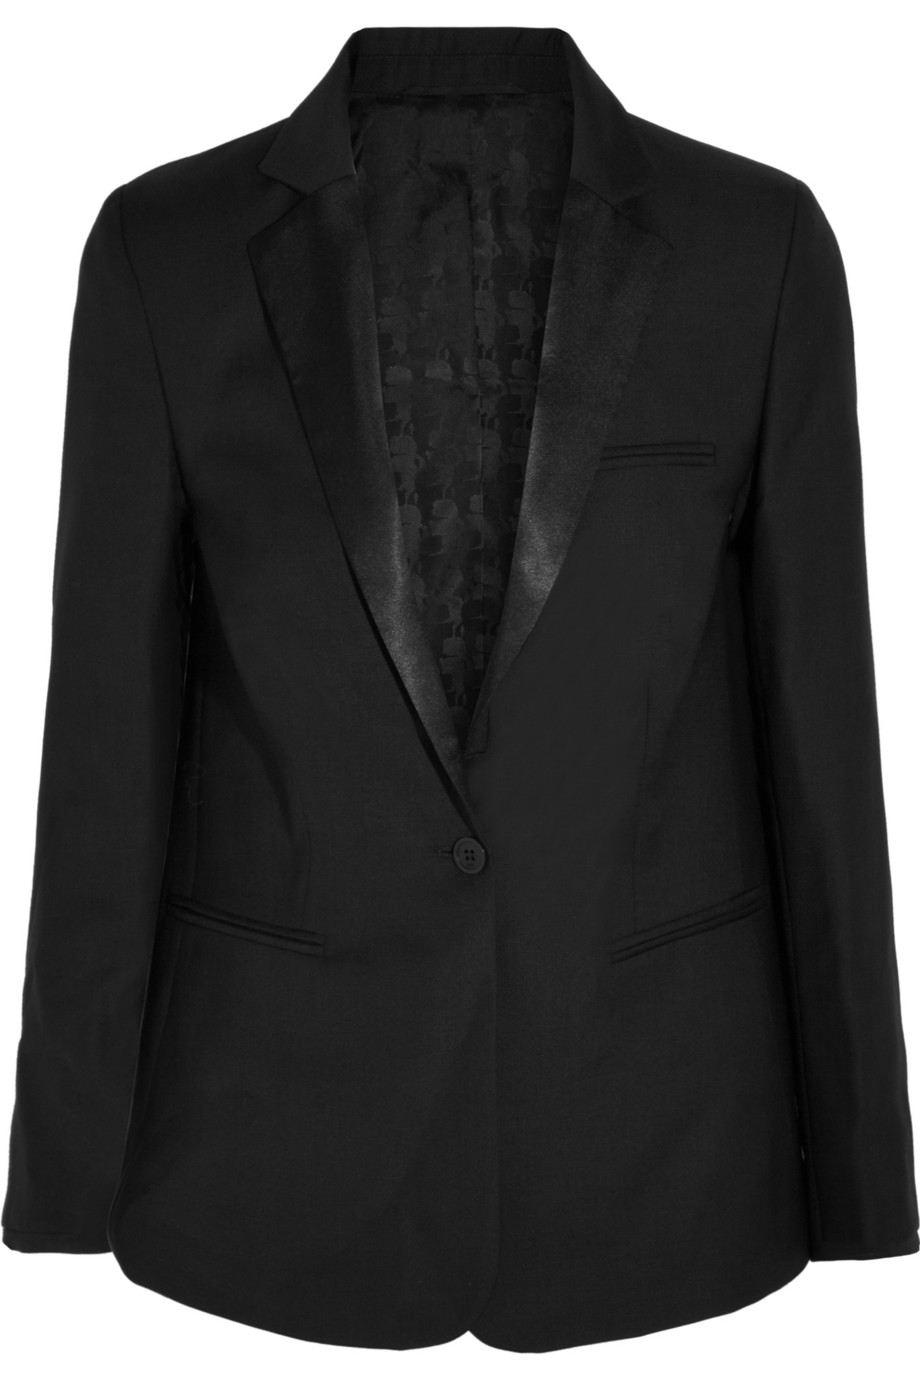 Karl Lagerfeld - Blazer(450 €)